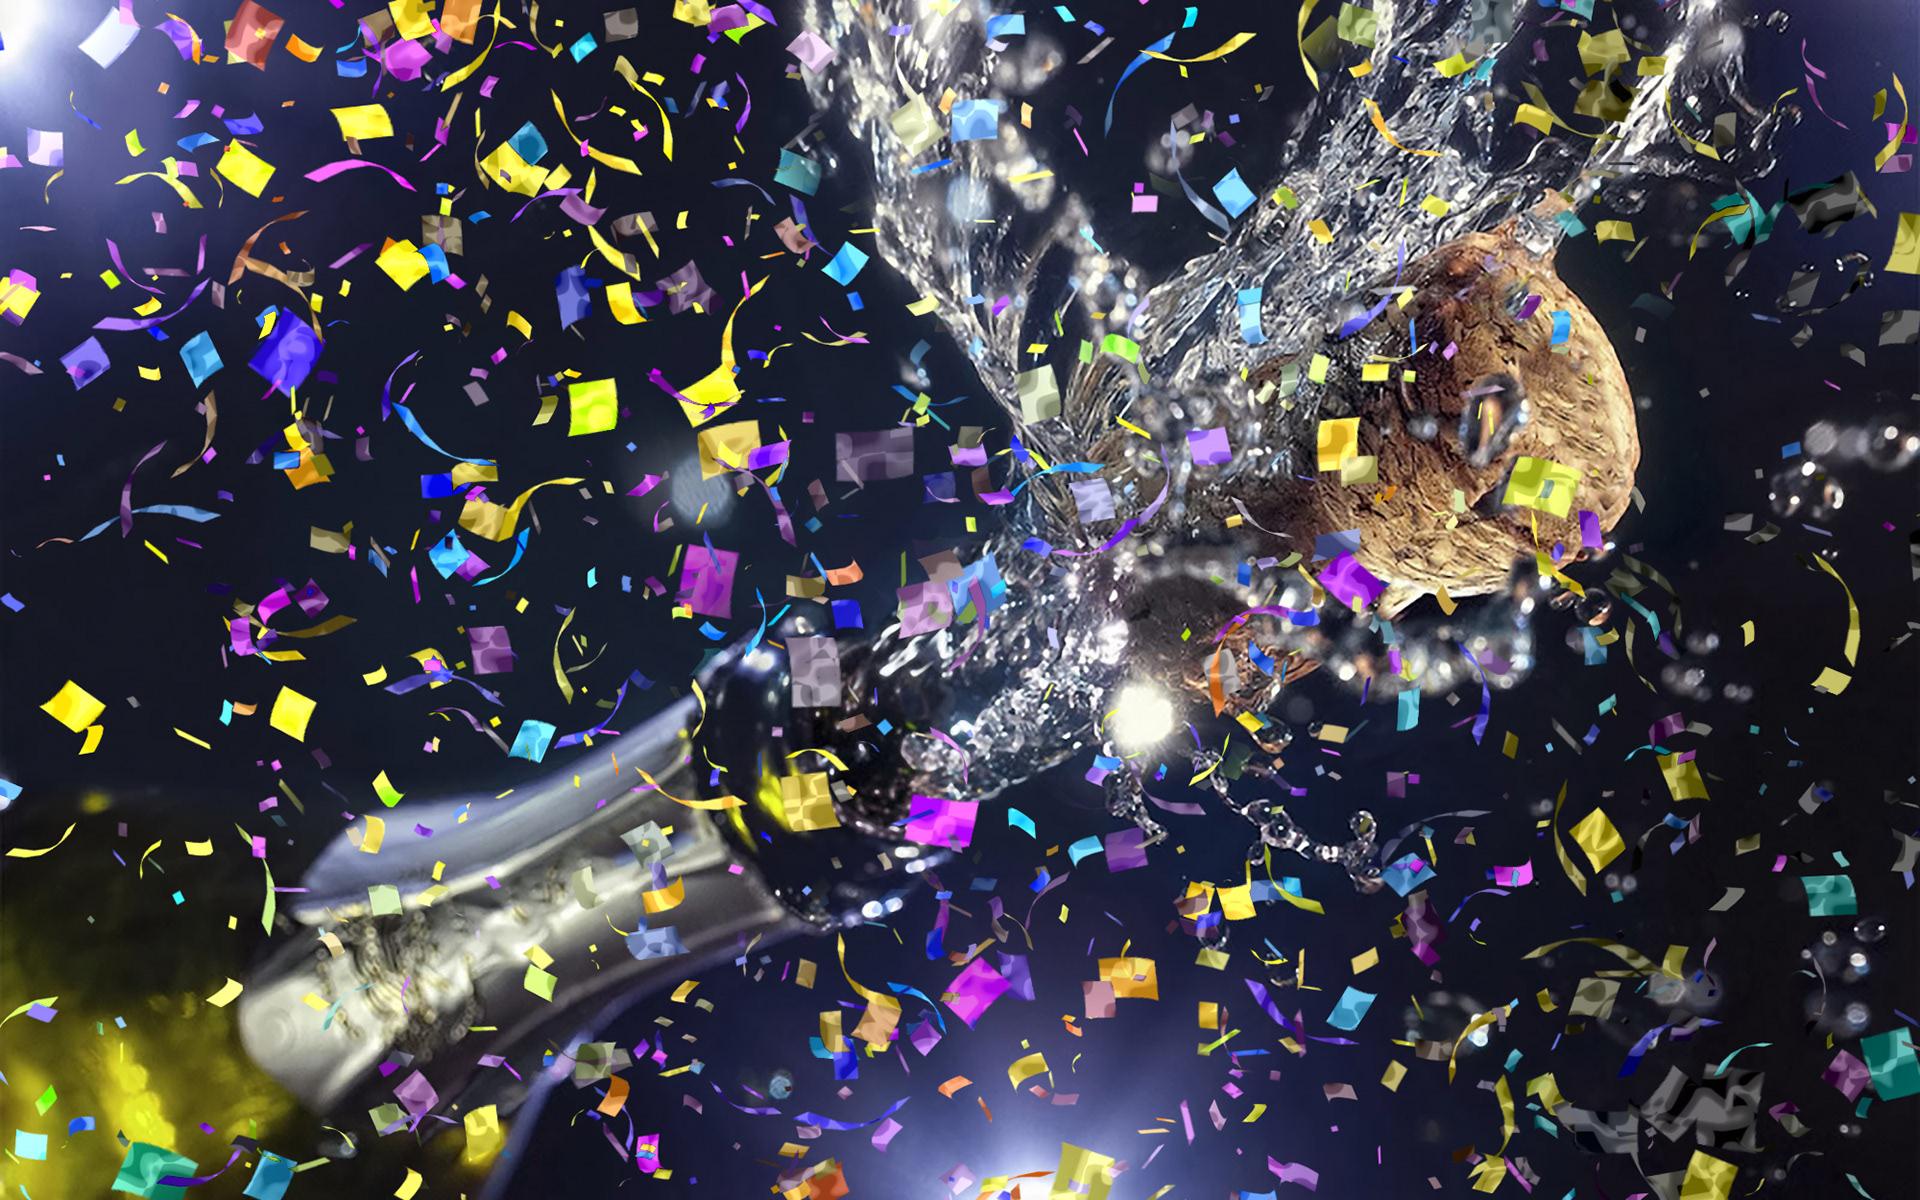 Gif Animated Confetti Glitter Effect Photoshop Action on Behance